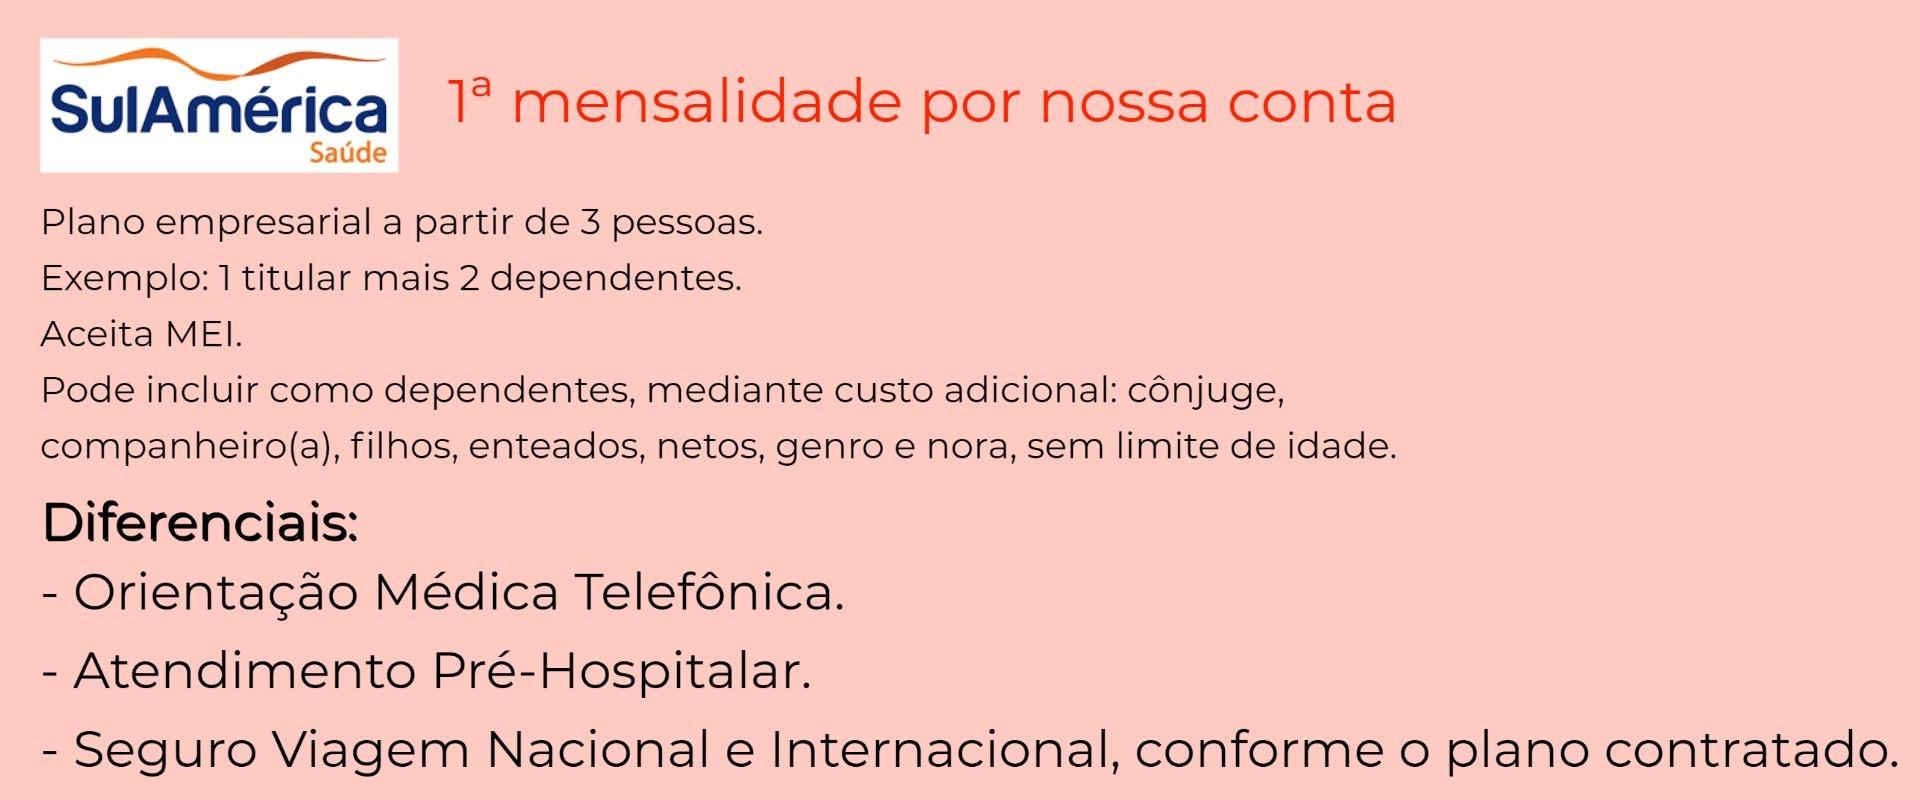 Sul América Saúde Empresarial - Santos